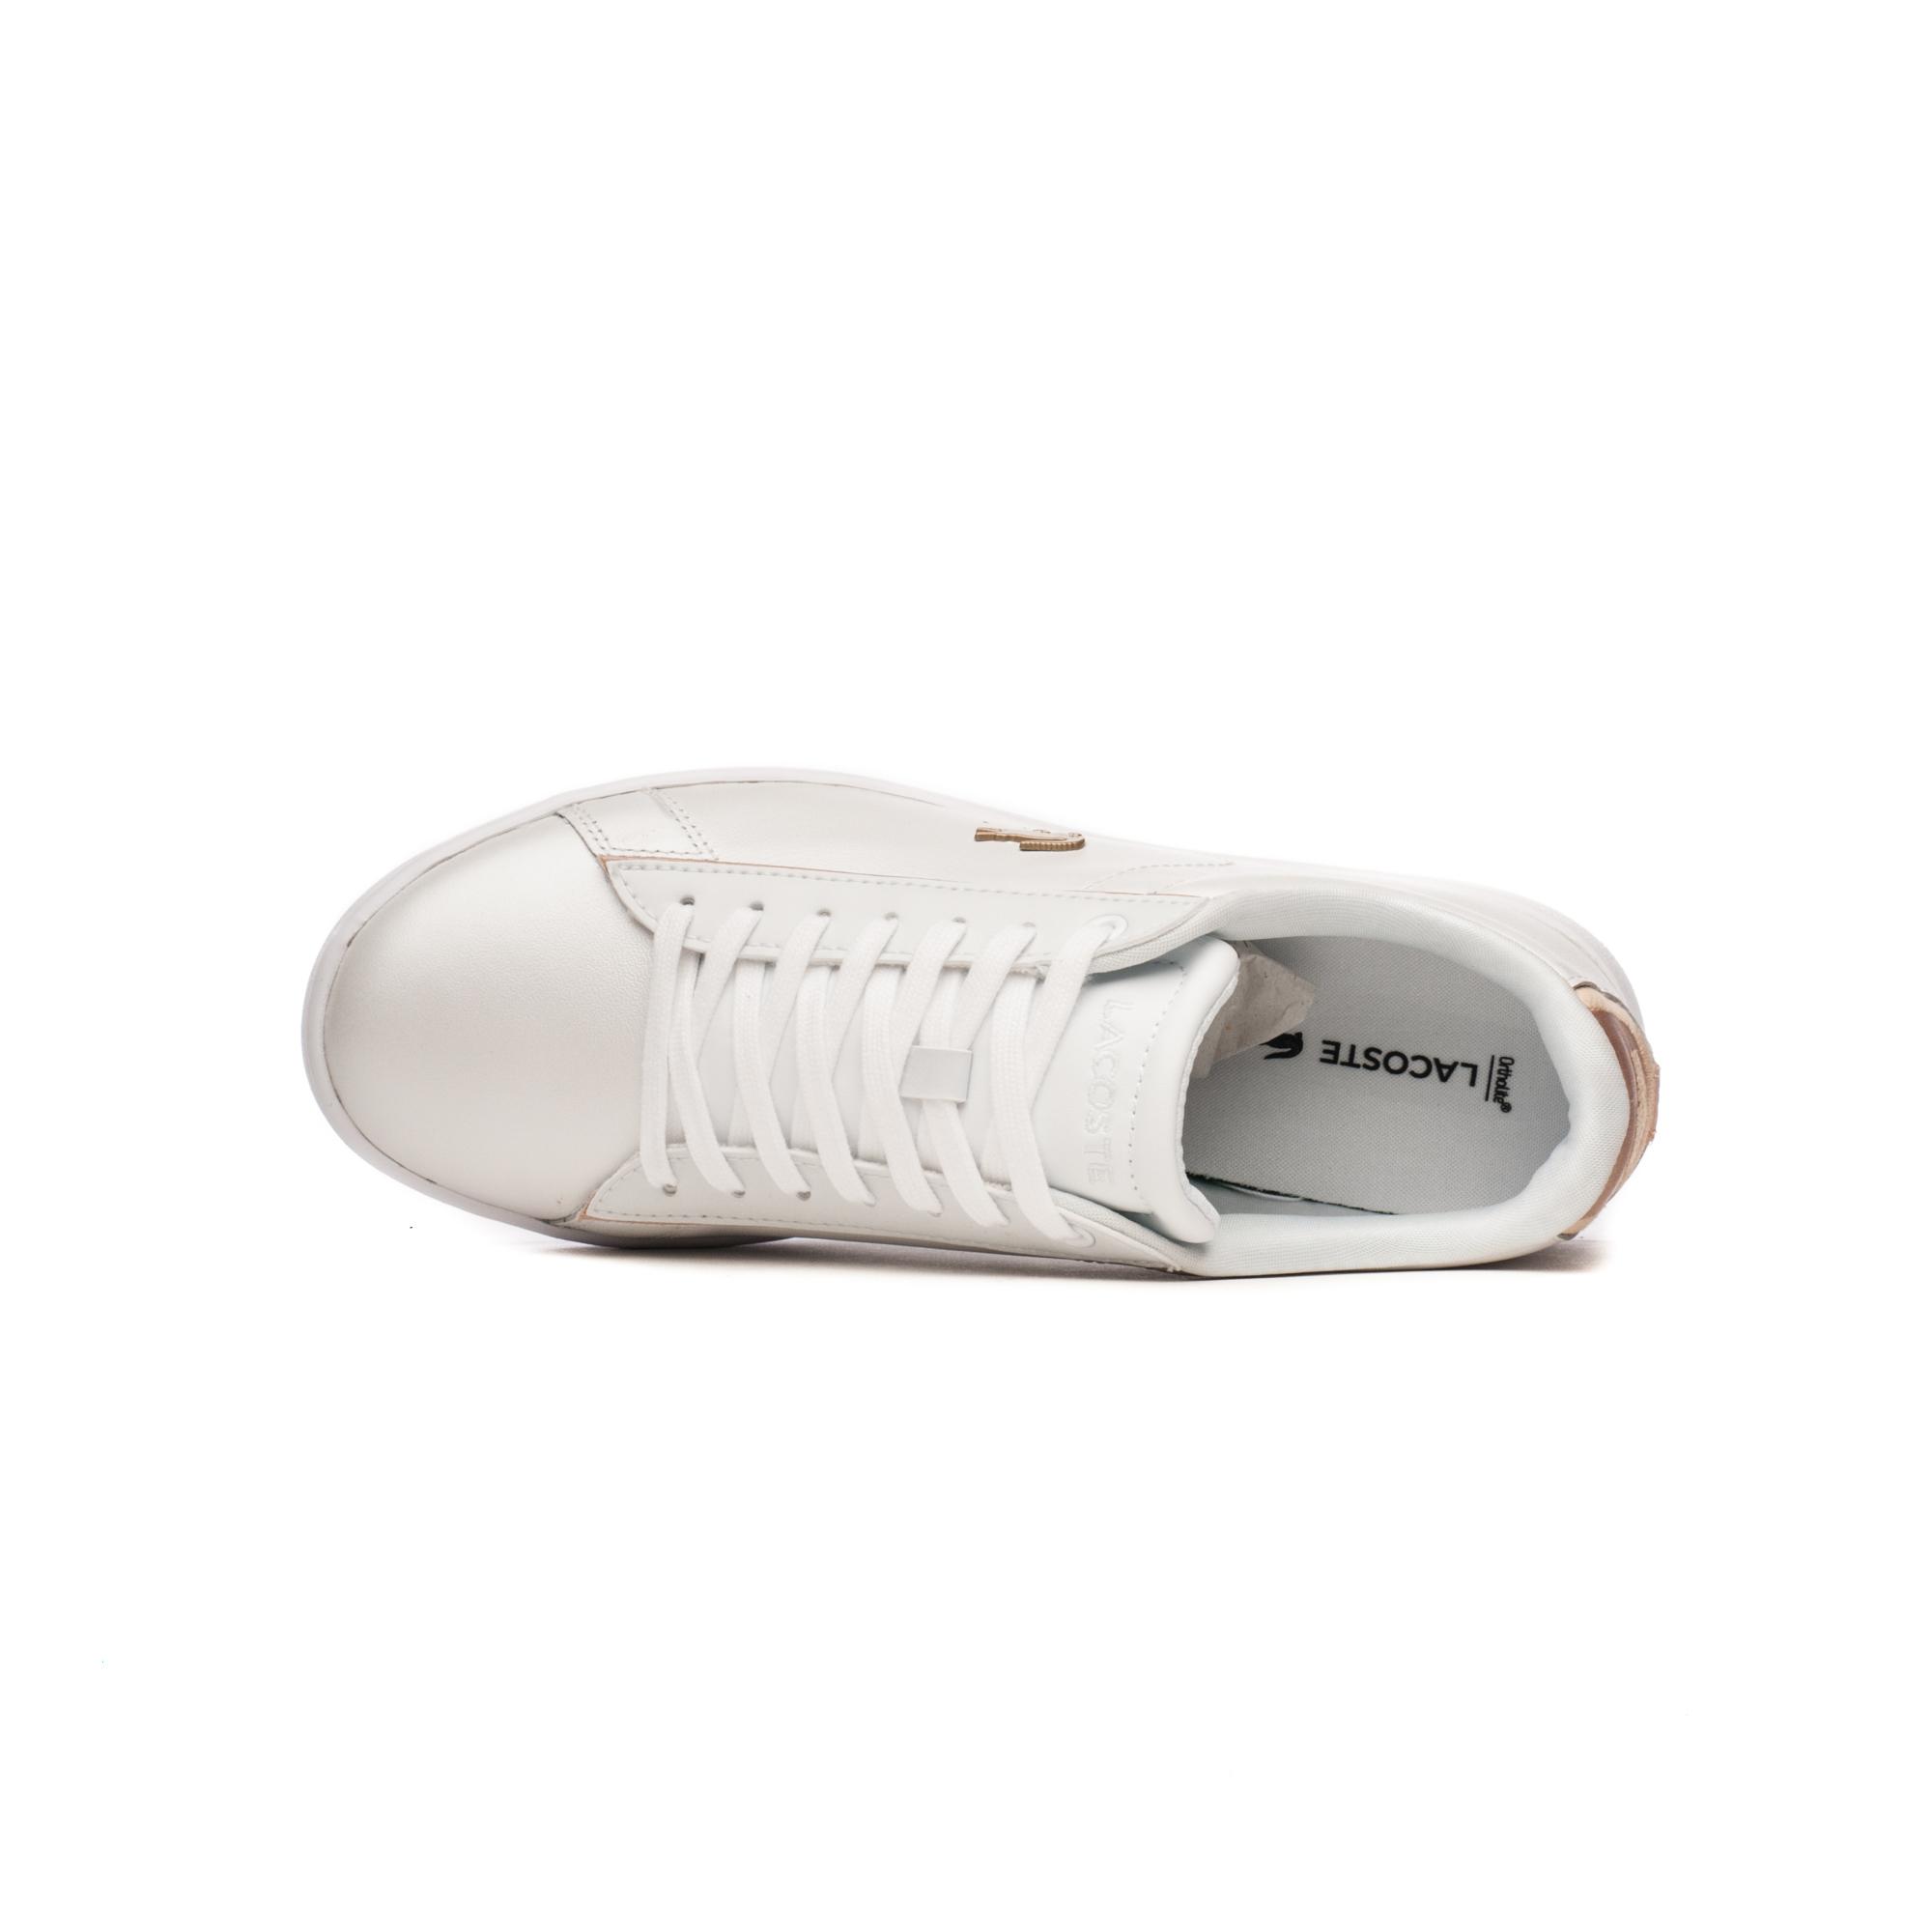 Кросівки жіночі Lacoste CARNABY EVO